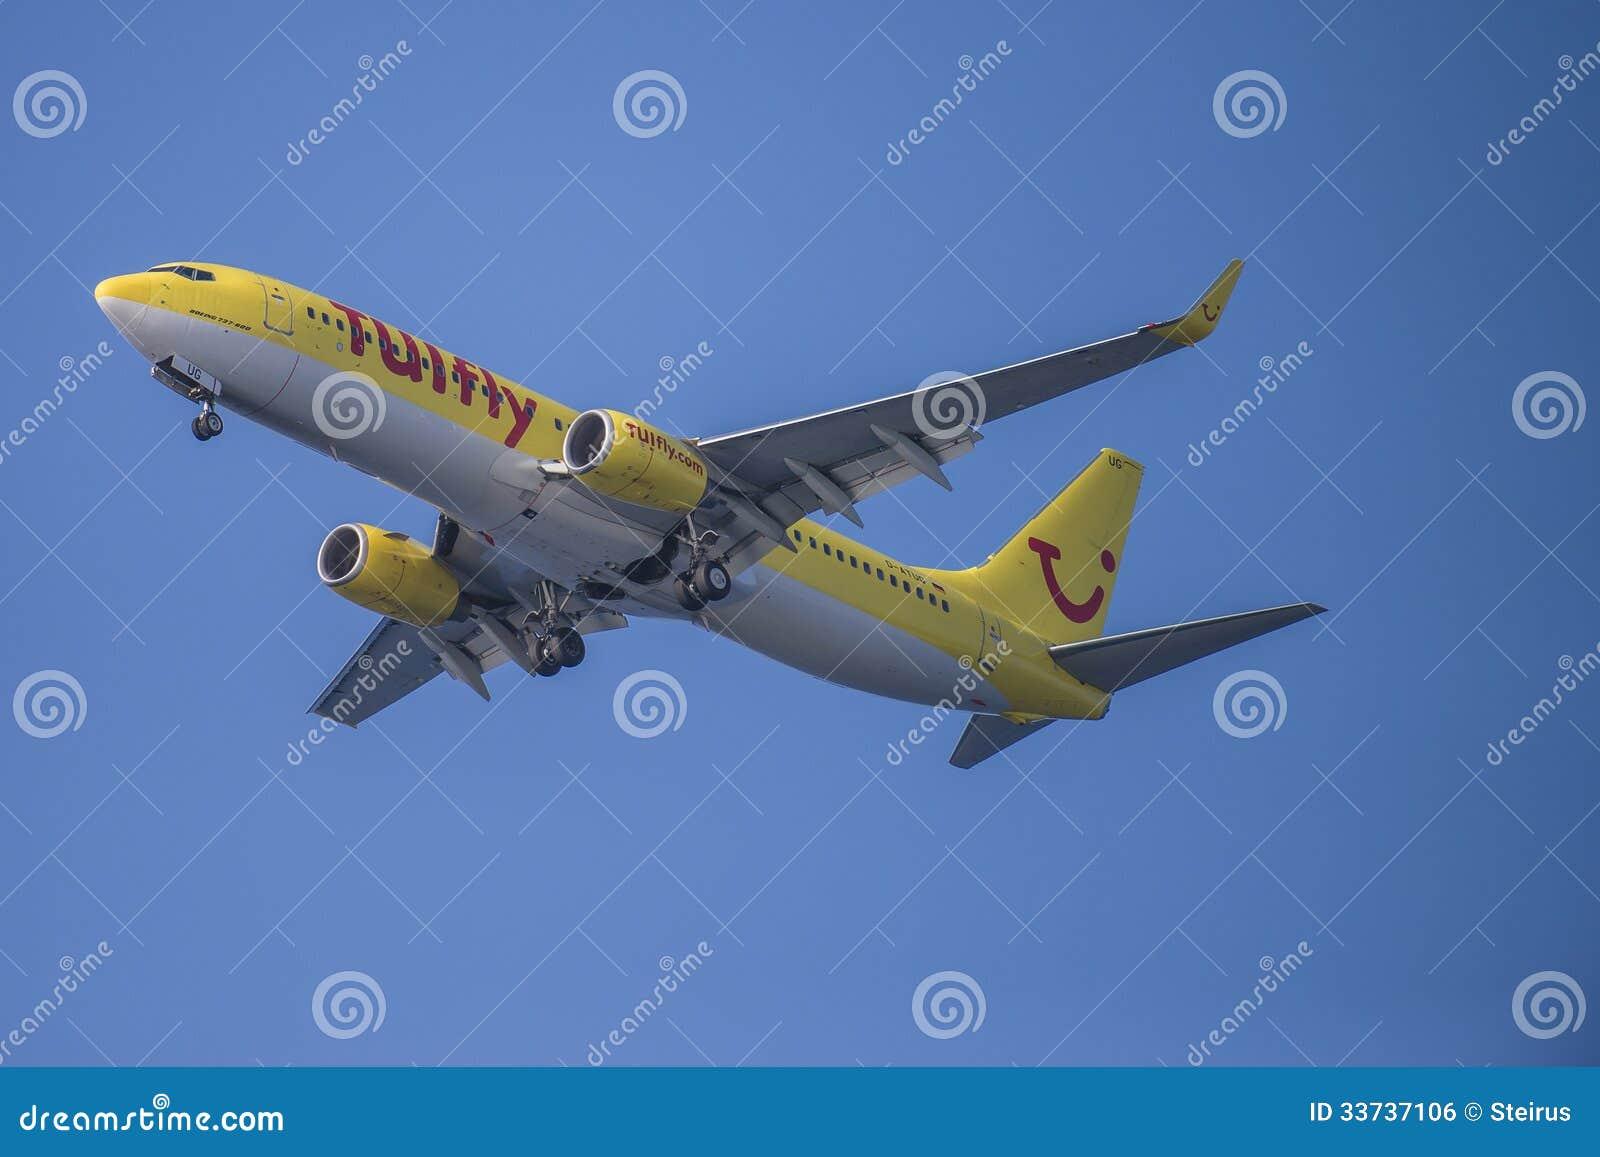 Tuifly, Германия, Боинг 737-800